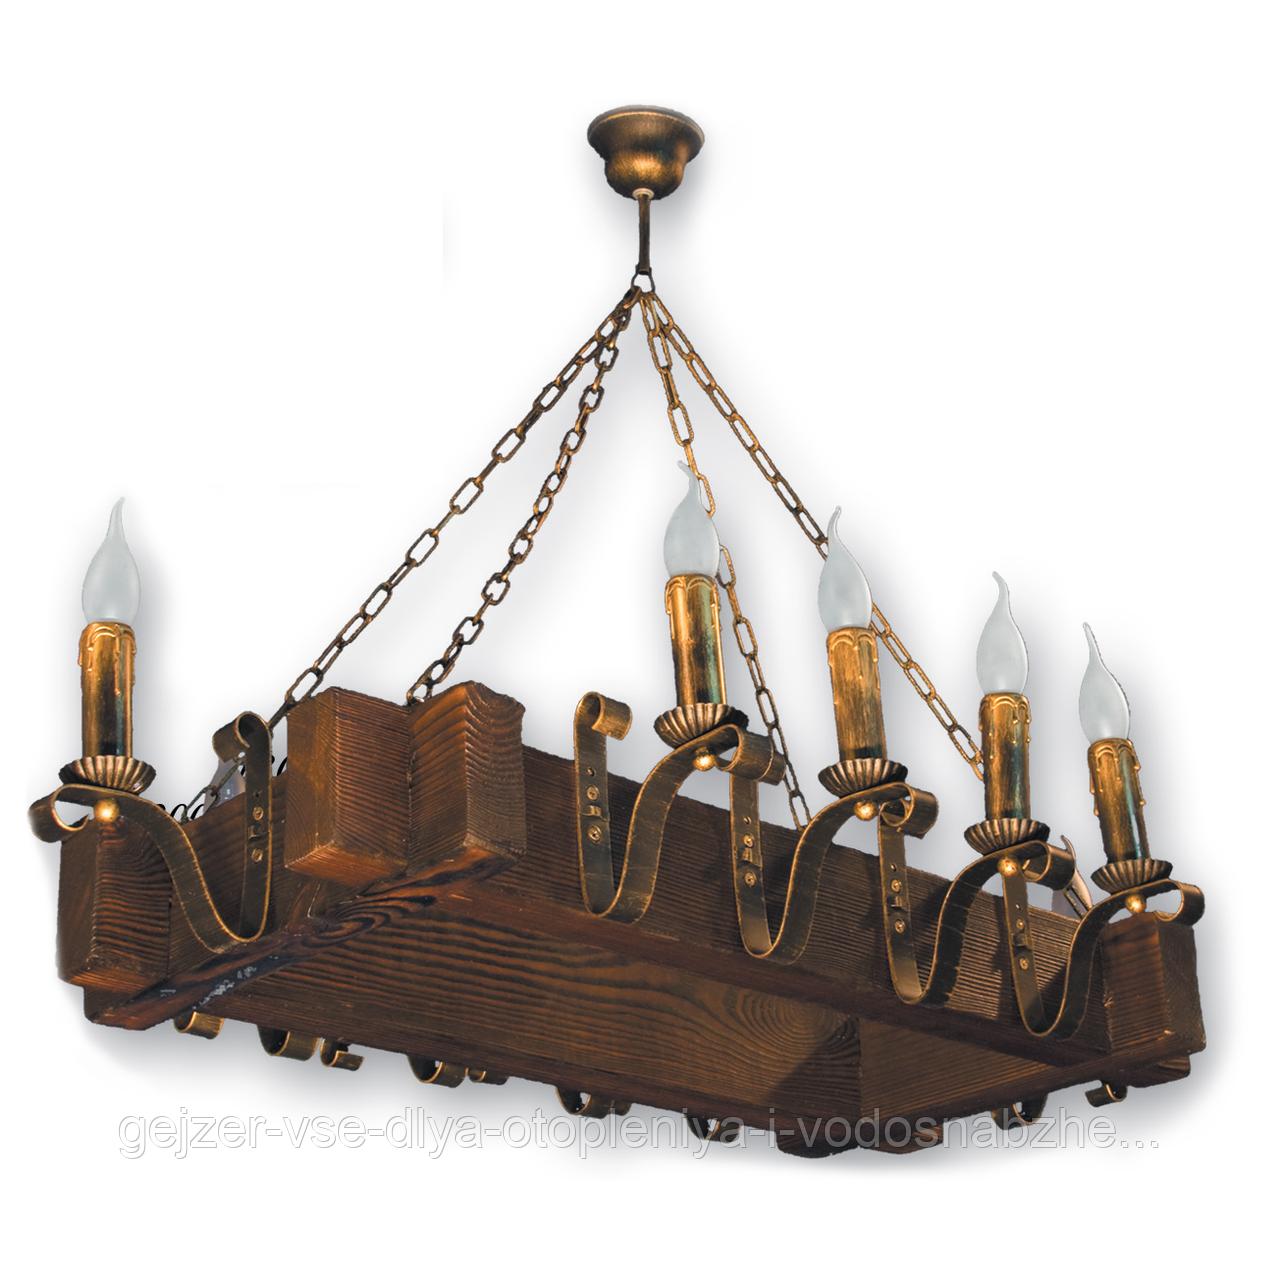 Люстра подвесная 10 свечей Е14 серии Lilia 4109210